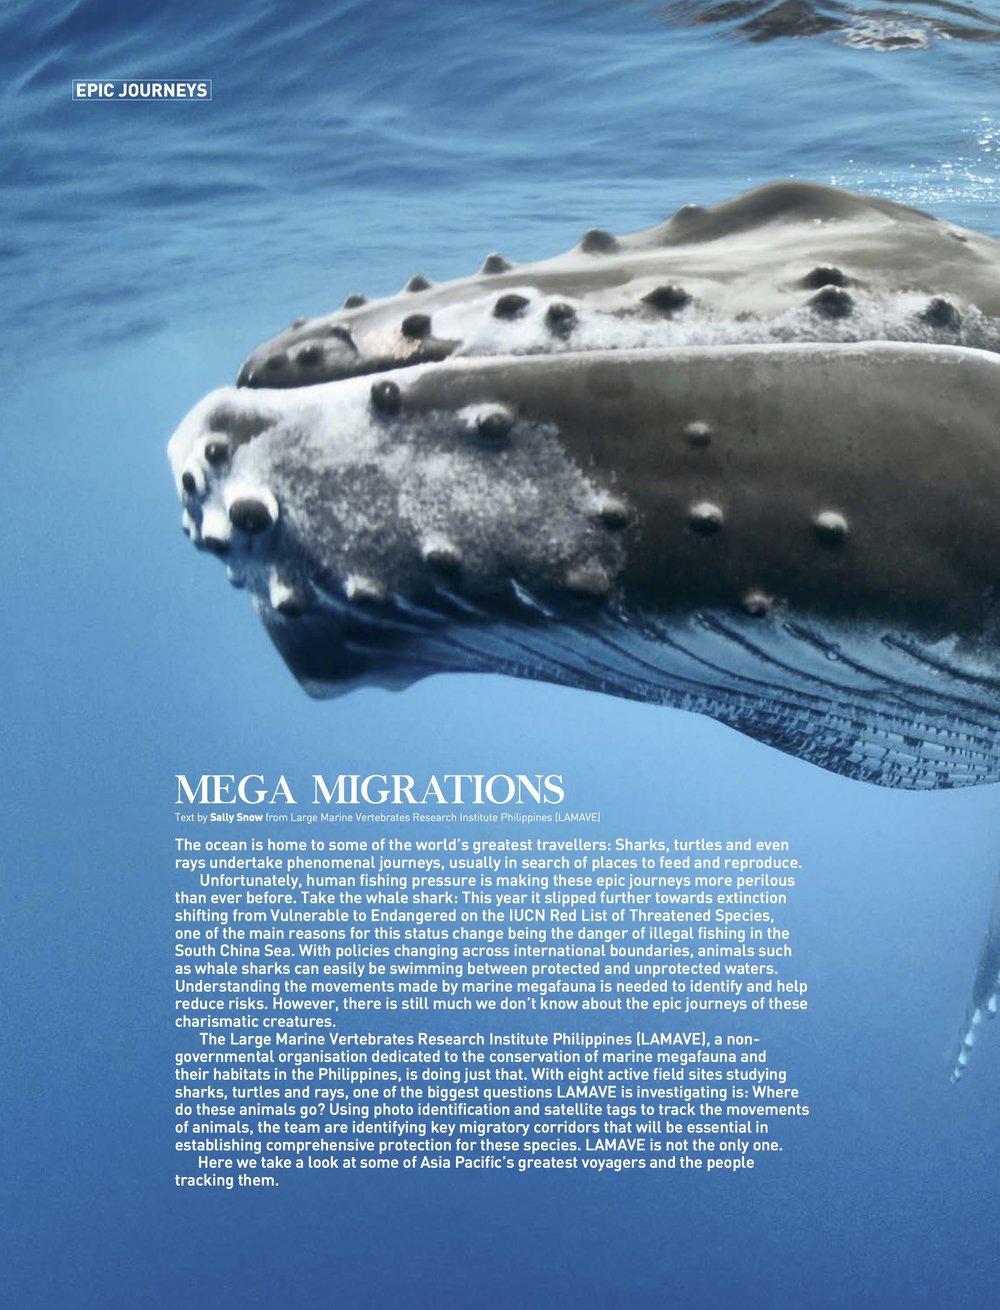 Mega Migrations from SDAA 7-Epic Journeys.jpg